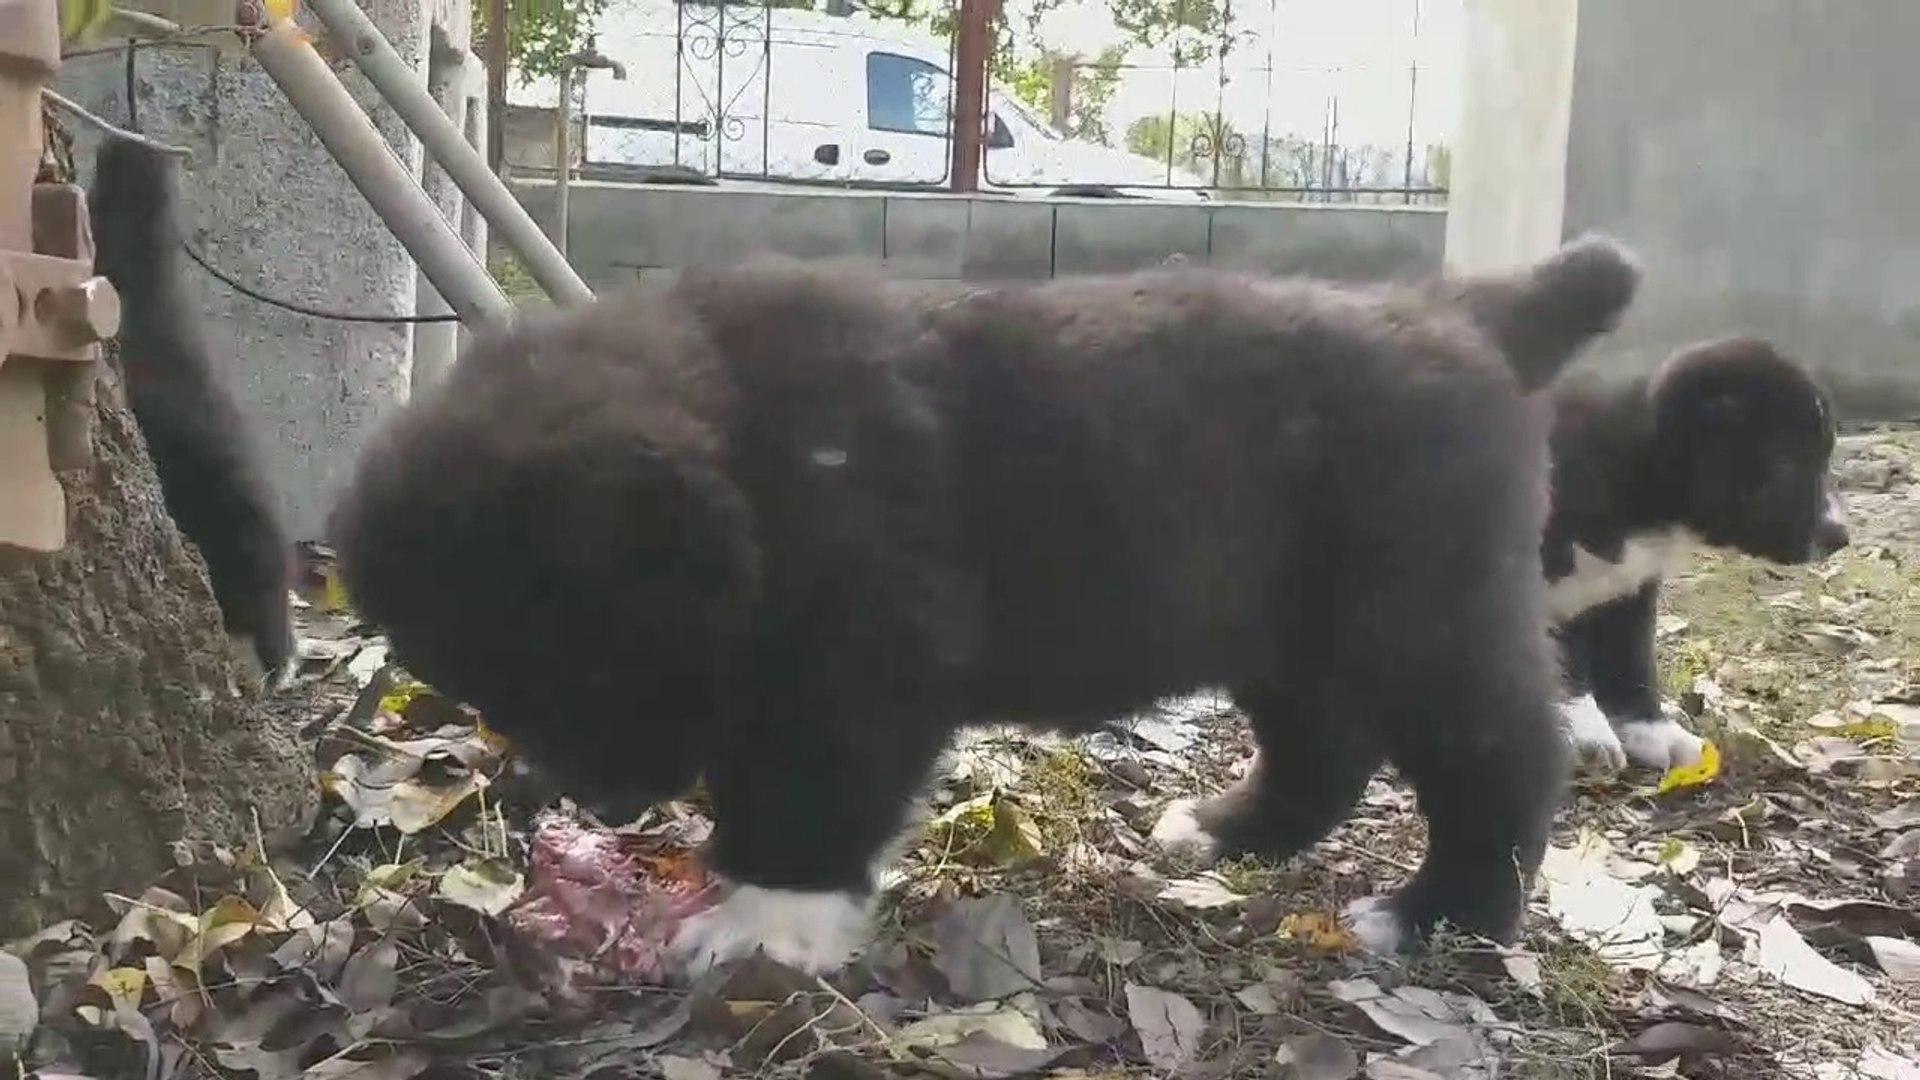 KARA ALABAY COBAN KOPEGi YAVRUSU SABAH KAHVALTISI ET - BLACK ALABAi SHEPHERD DOG PUPPY EAT at BREAKF